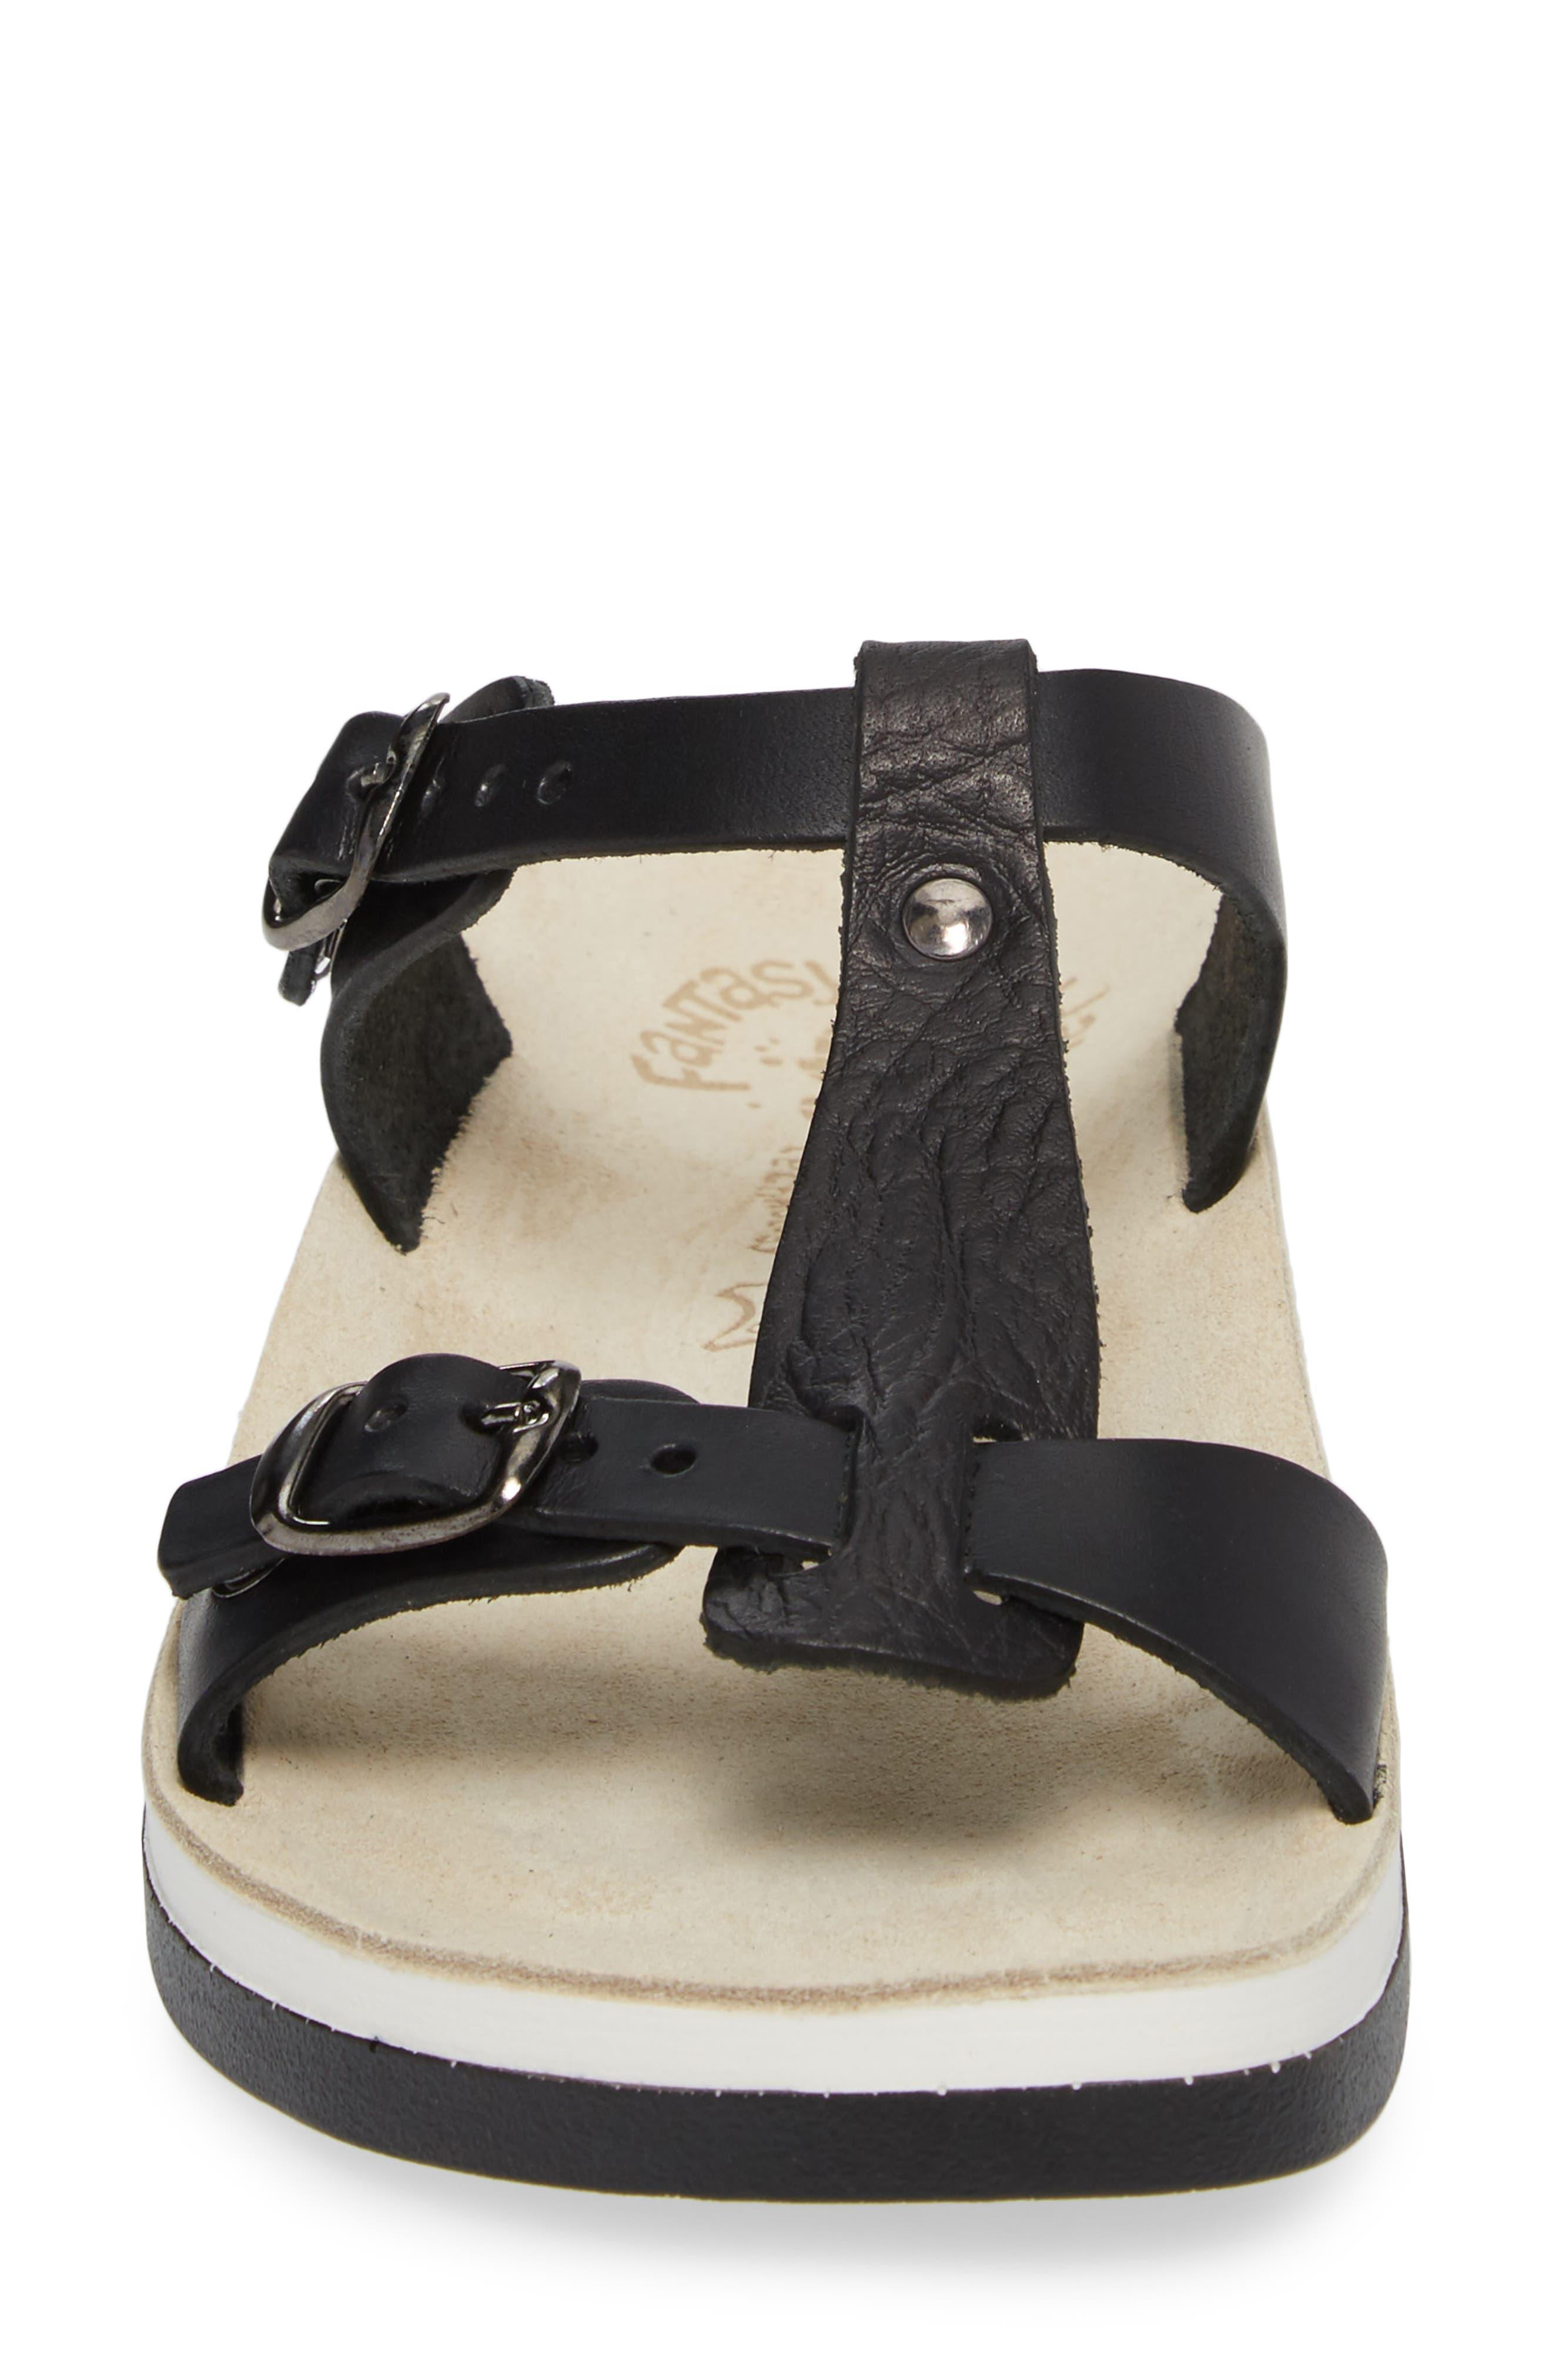 Jessamine T-Strap Sandal,                             Alternate thumbnail 4, color,                             Black Volcano Leather